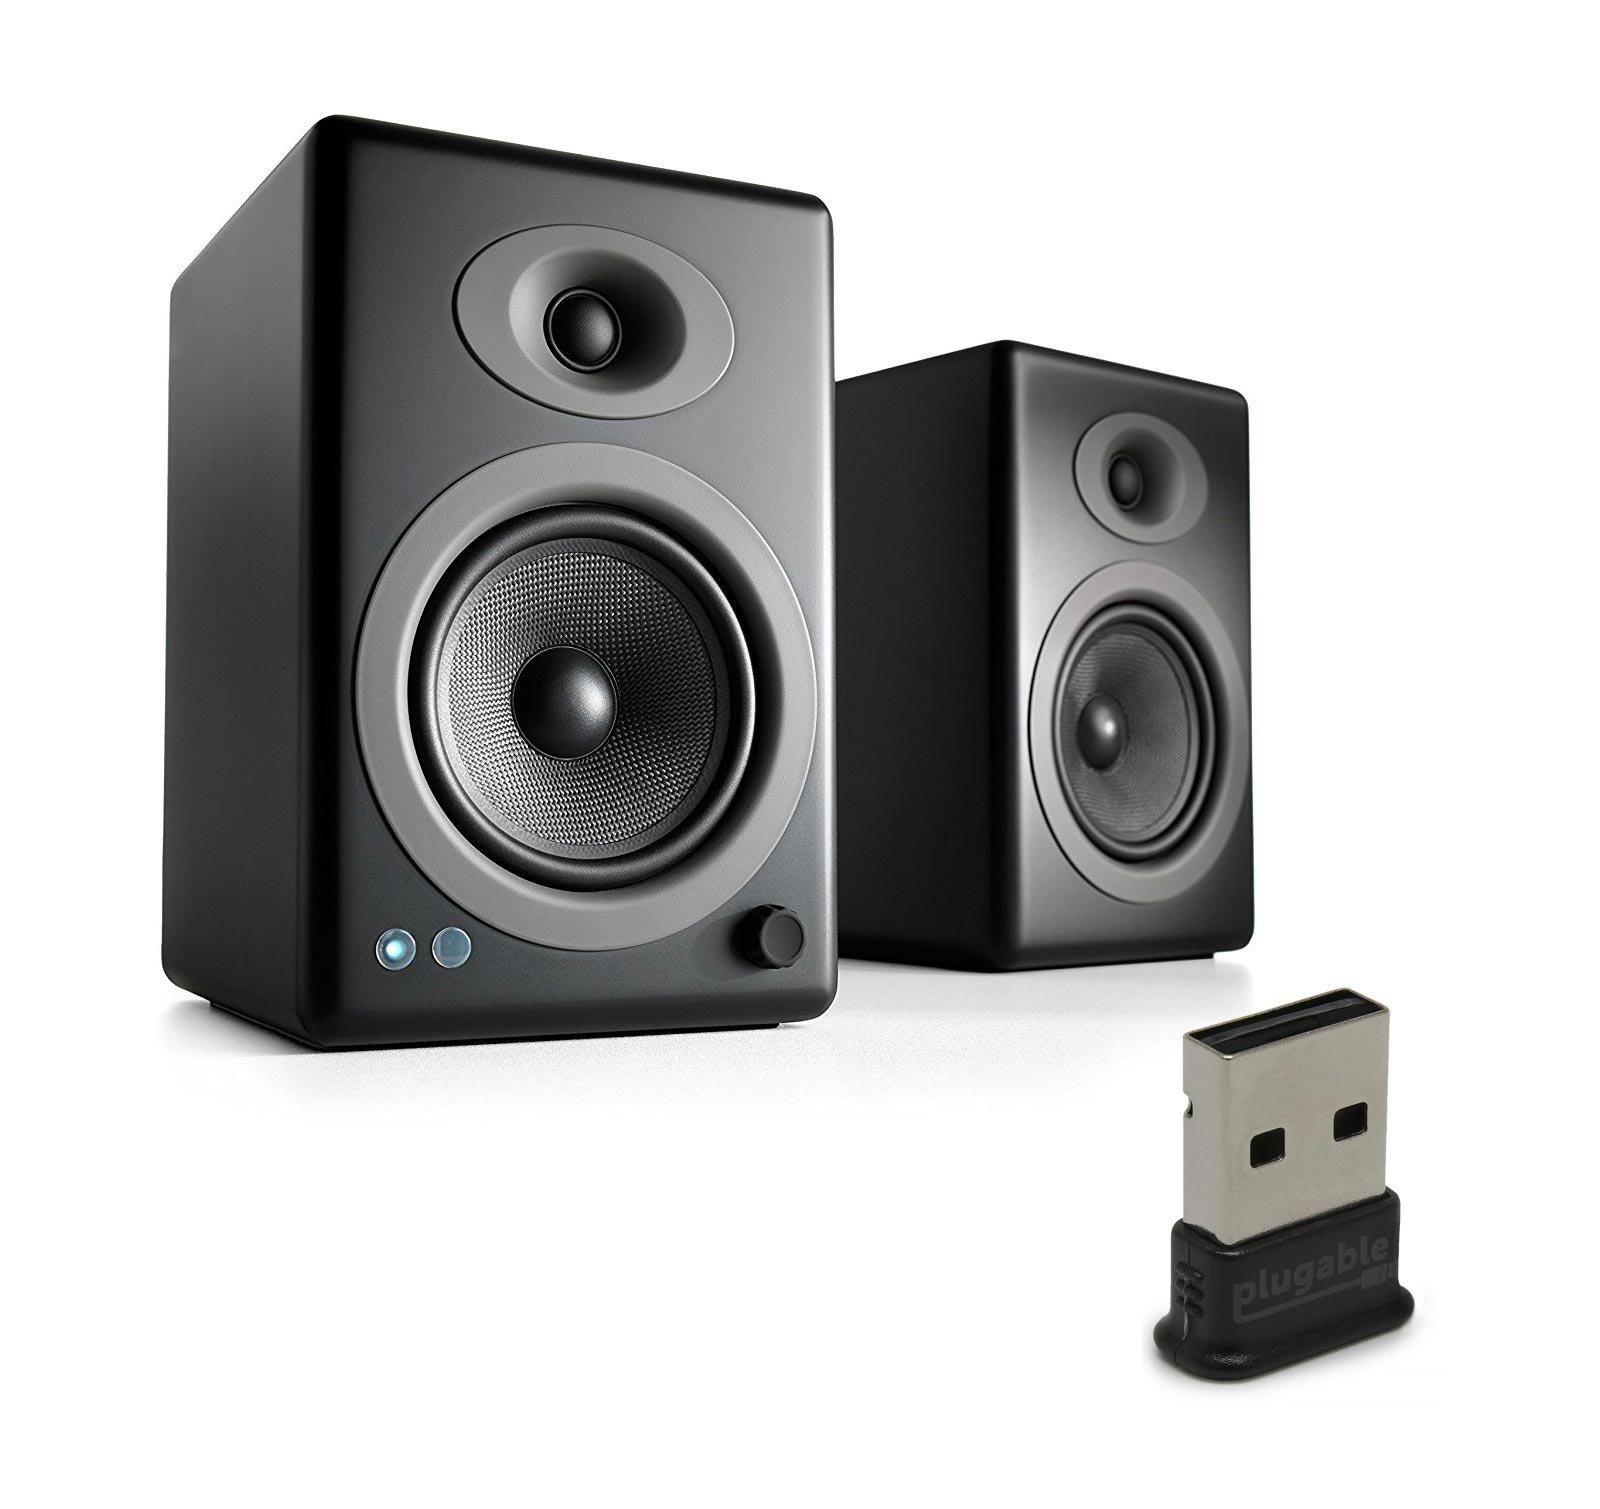 Audioengine A5+ Wireless Speakers (Pair) with Plugable USB 2.0 Bluetooth Adapter (Black) by Audioengine (Image #1)